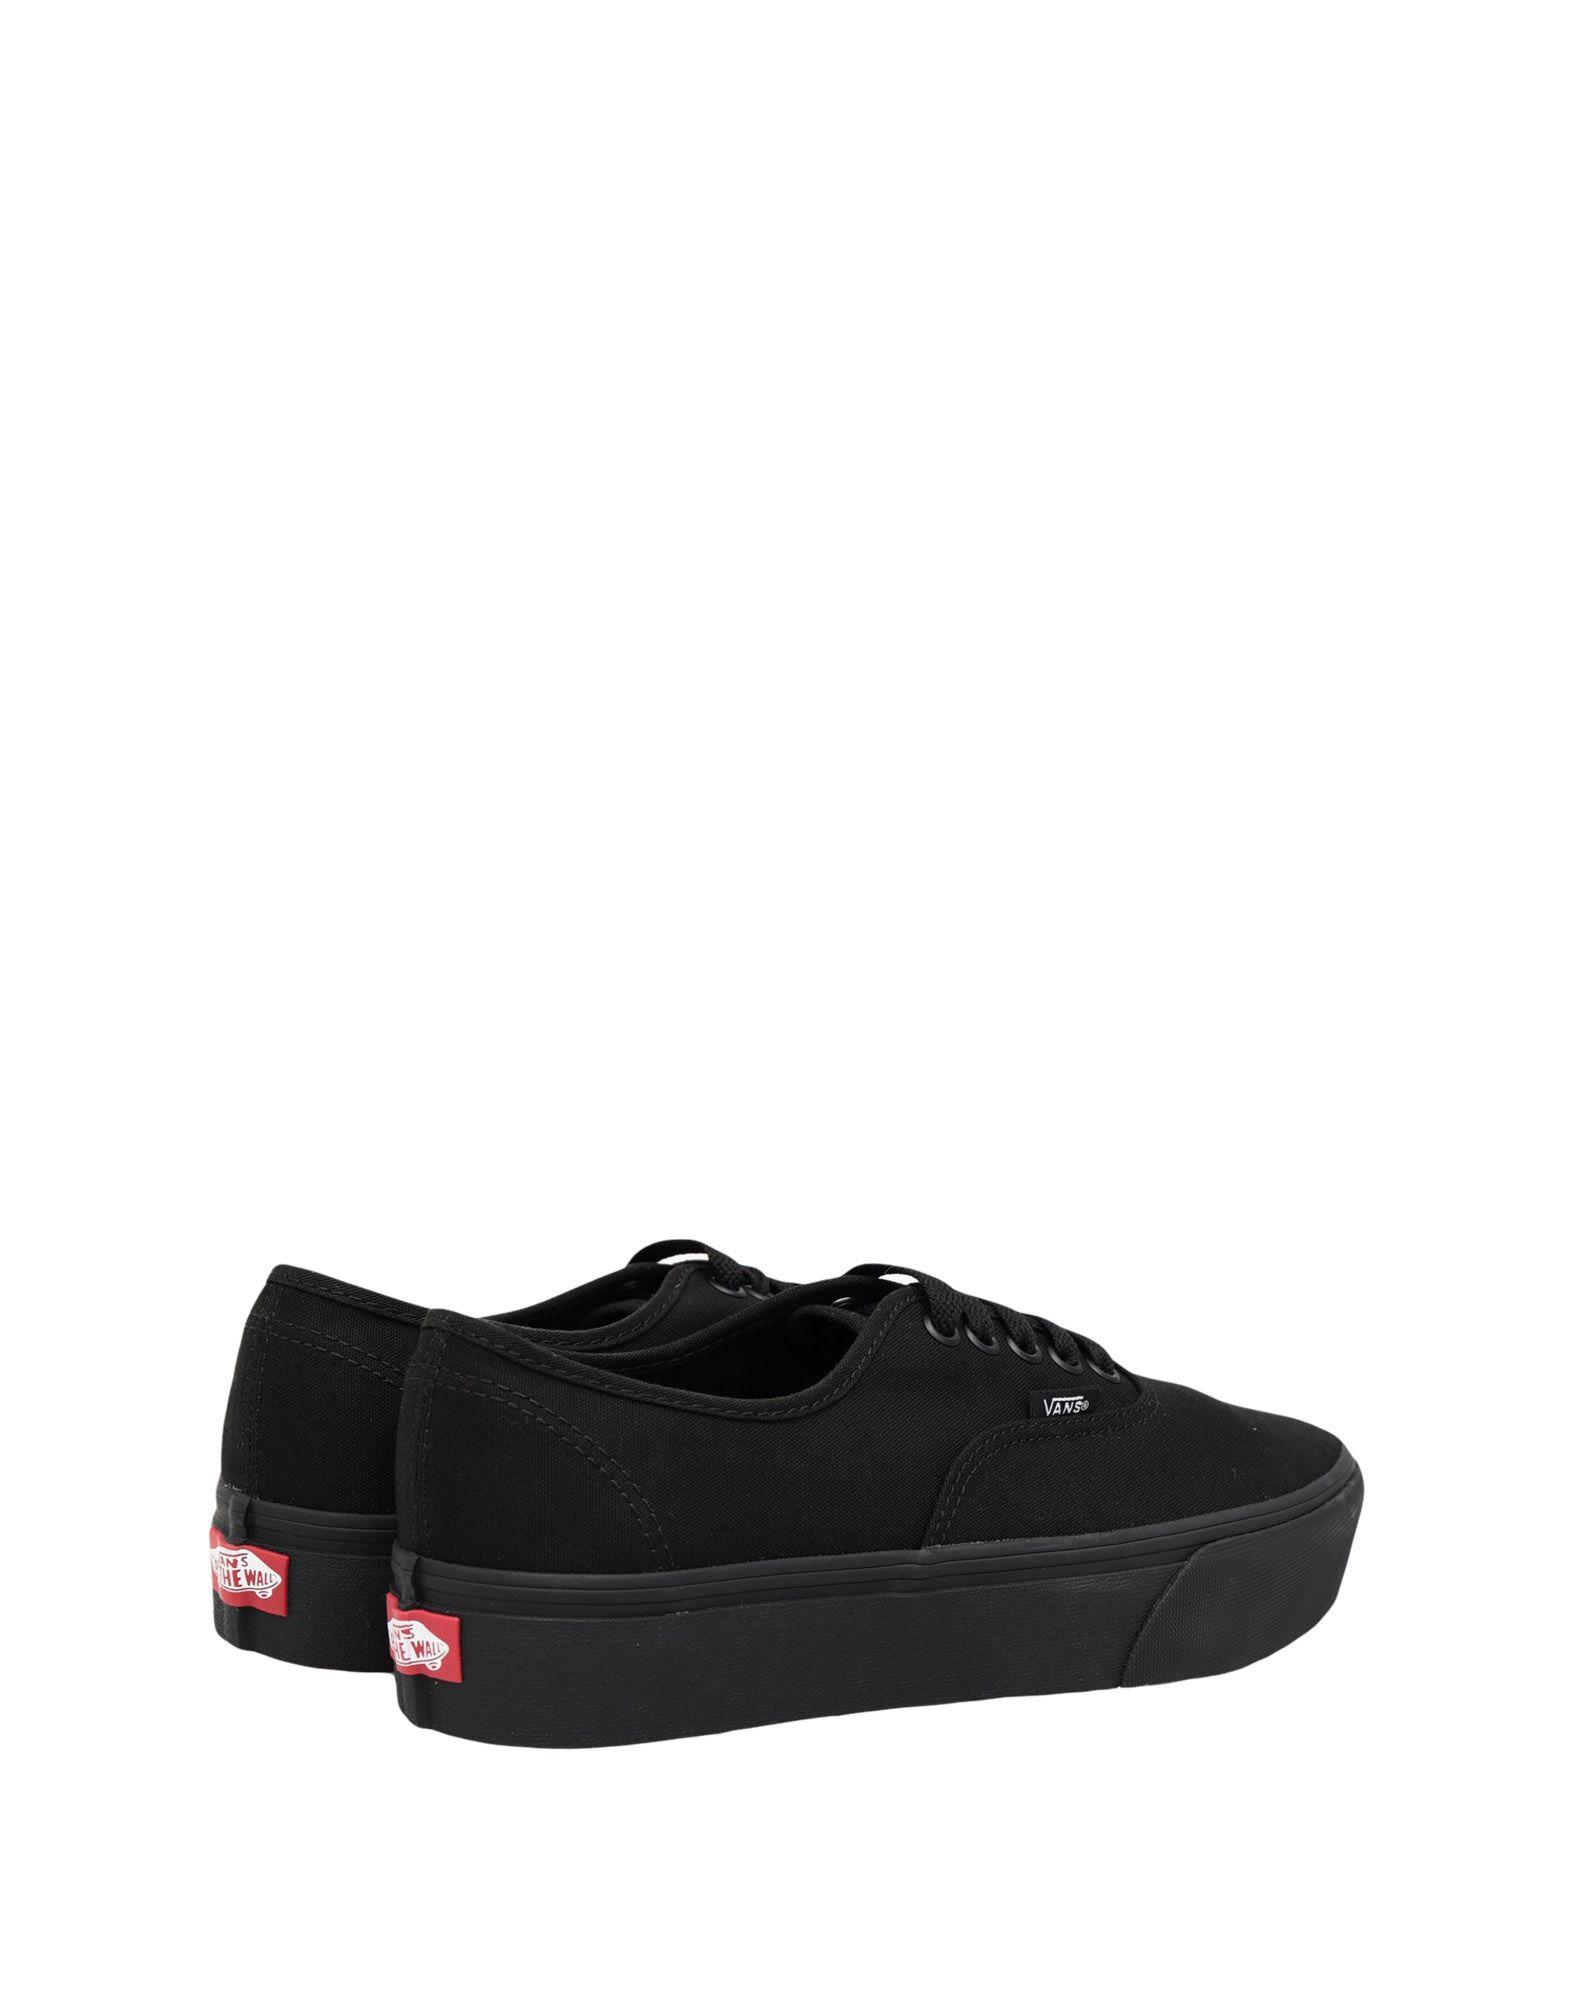 Vans Vans Vans Ua Authentic Platform (Pig Suede) 11559668JV Gute Qualität beliebte Schuhe b8048e